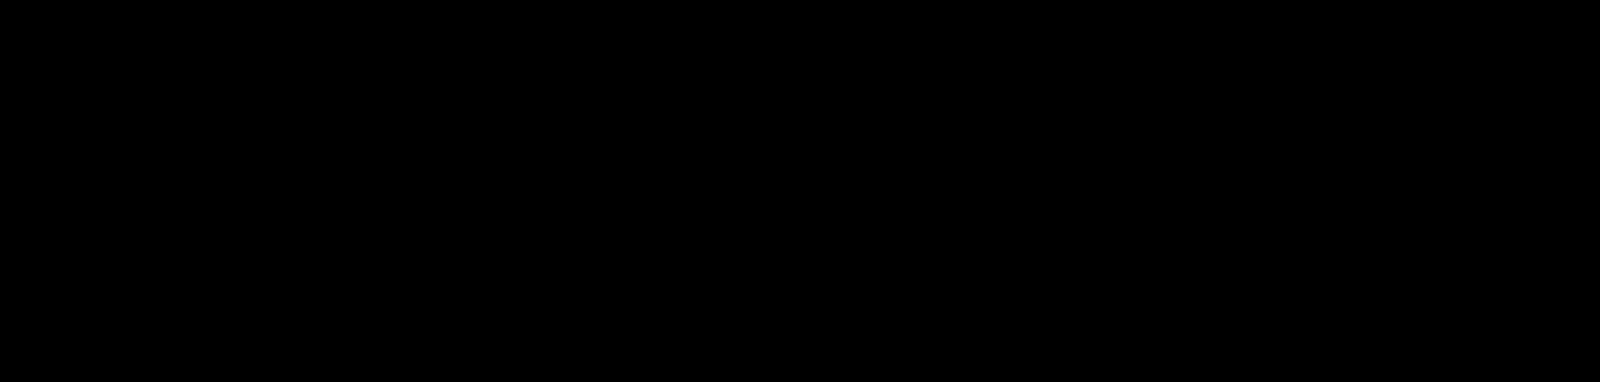 amd logo 2 1 - AMD Logo